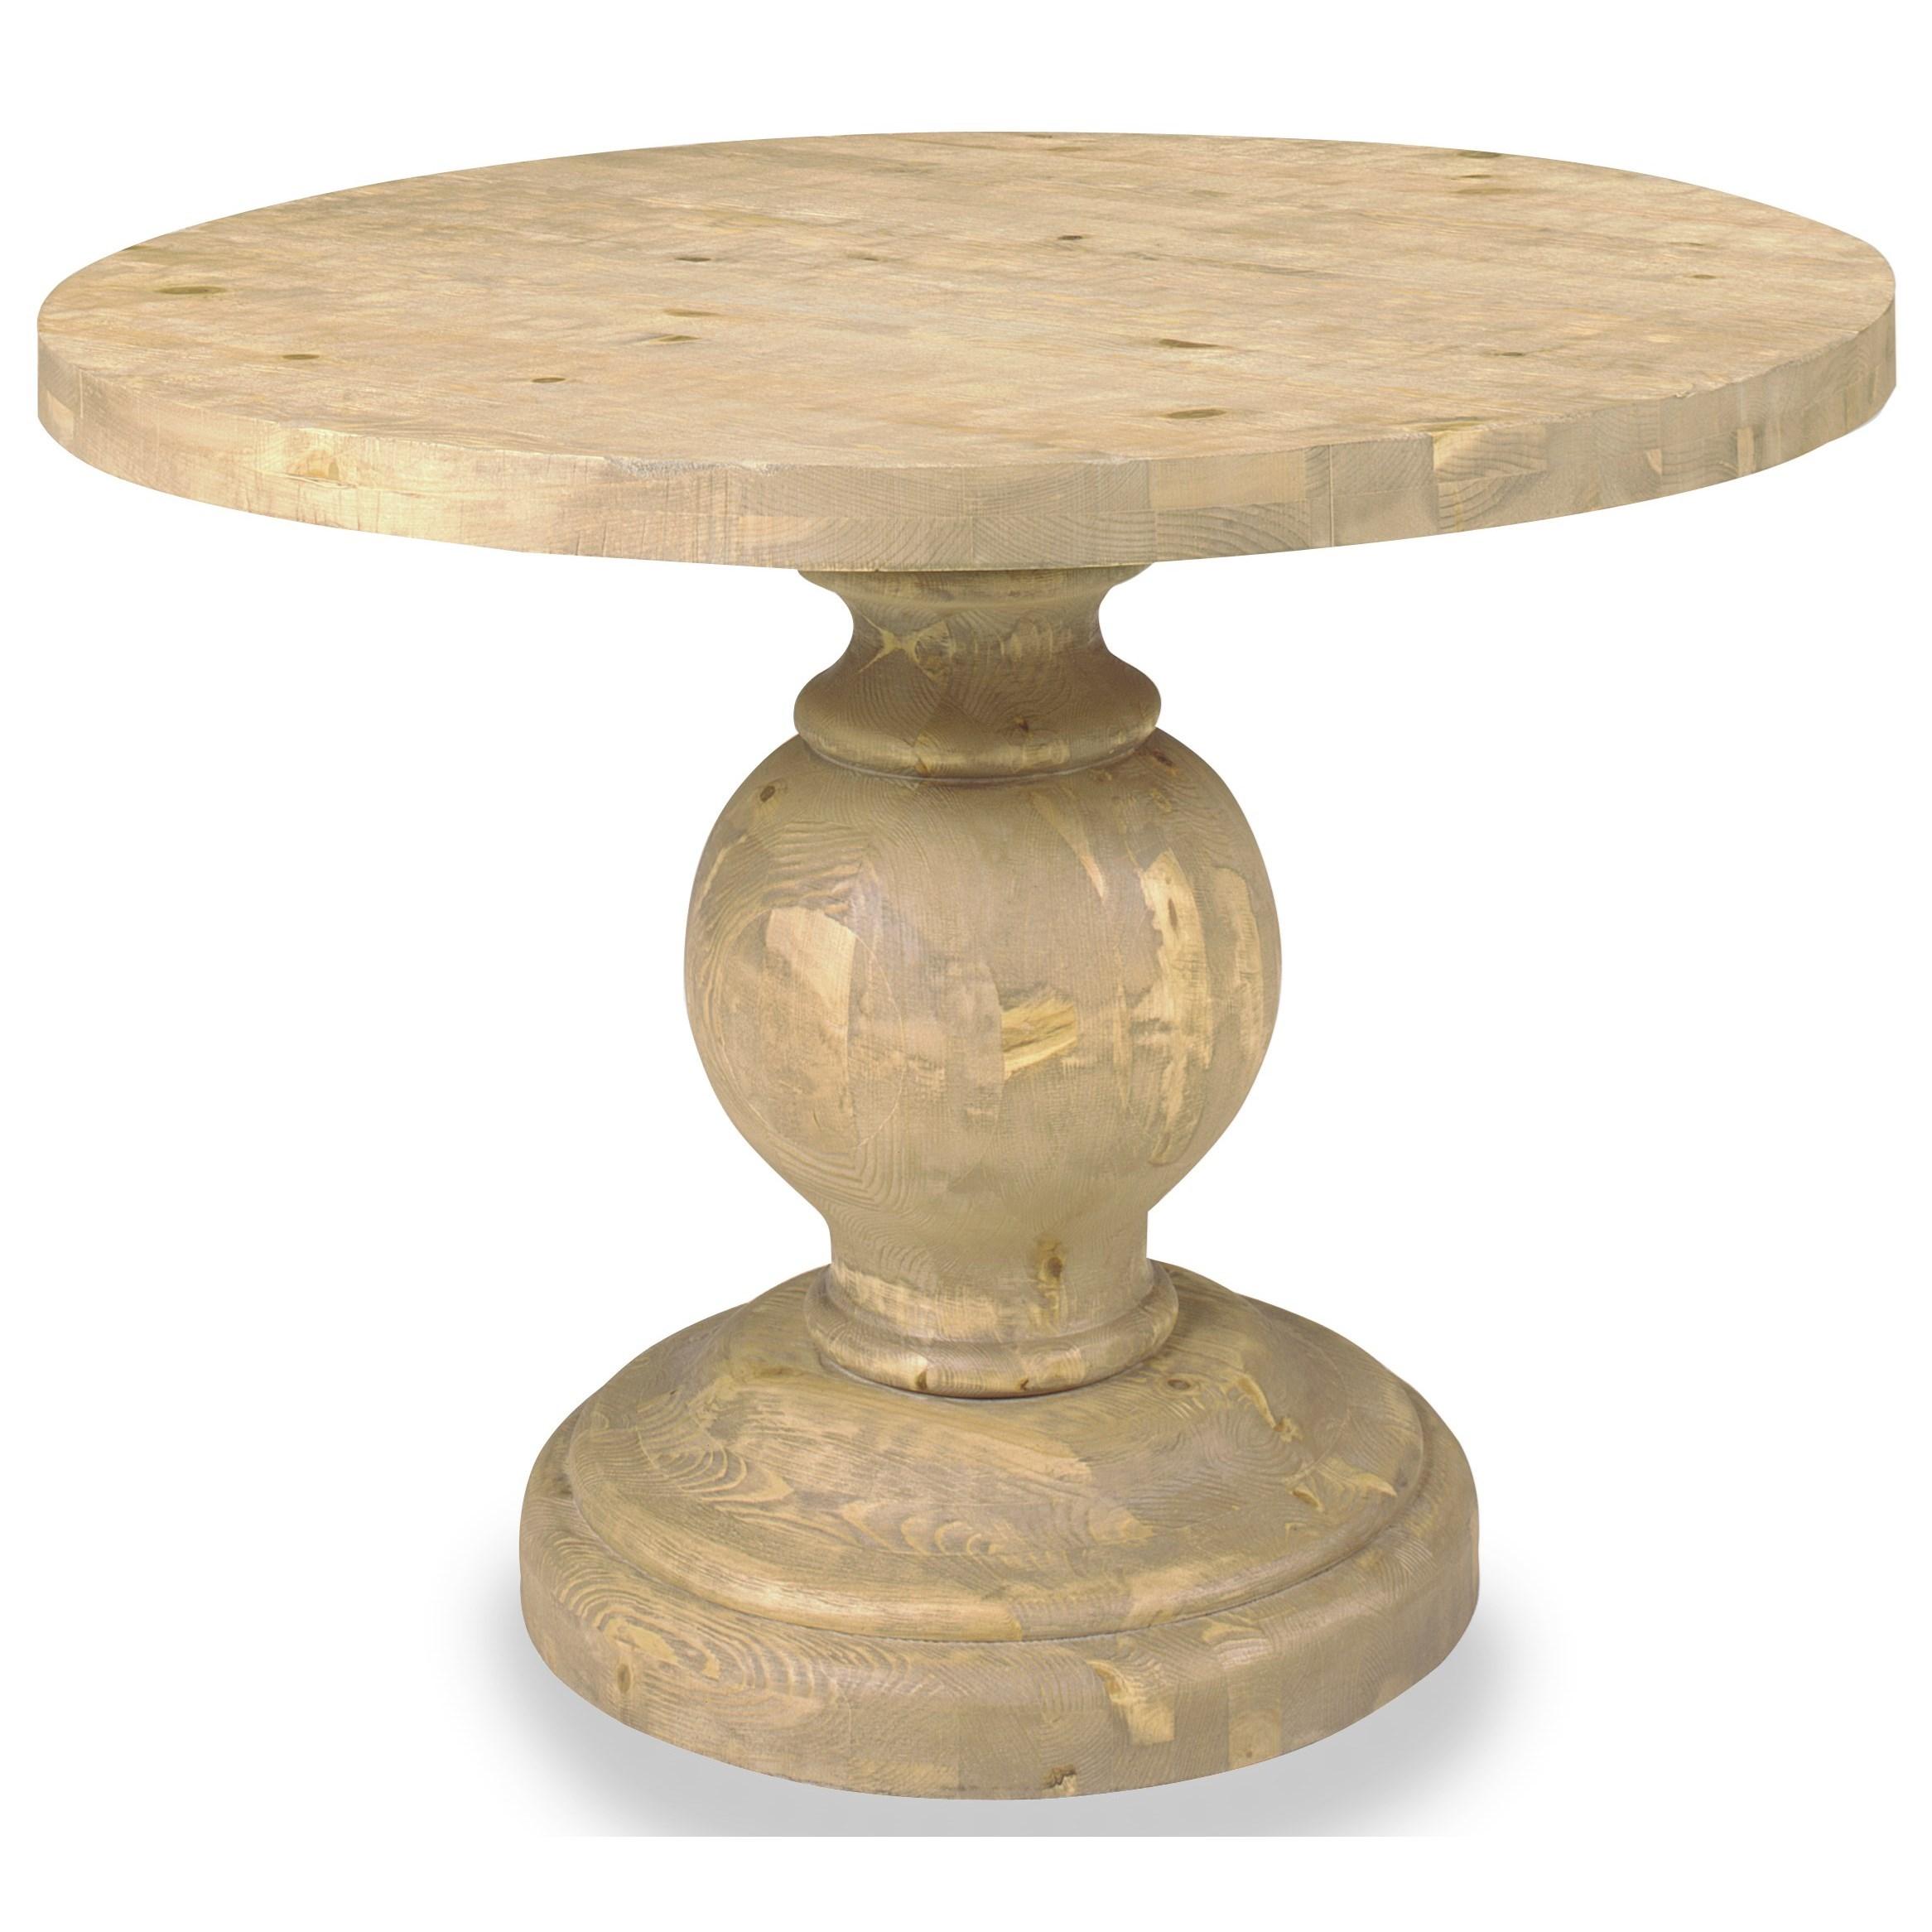 Progressive Furniture Bianca Pedestal Dining Table - Item Number: A711-58B+58T